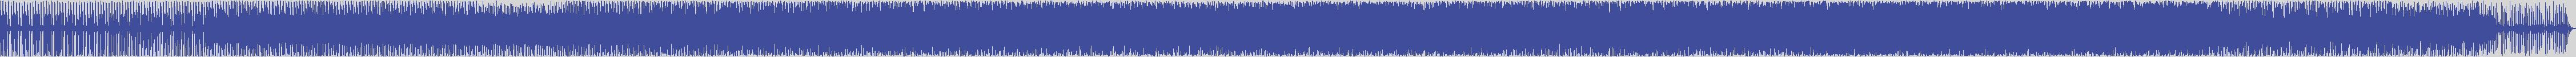 just_digital_records [smile1140] Southern Renx - Karma [Original Mix] audio wave form